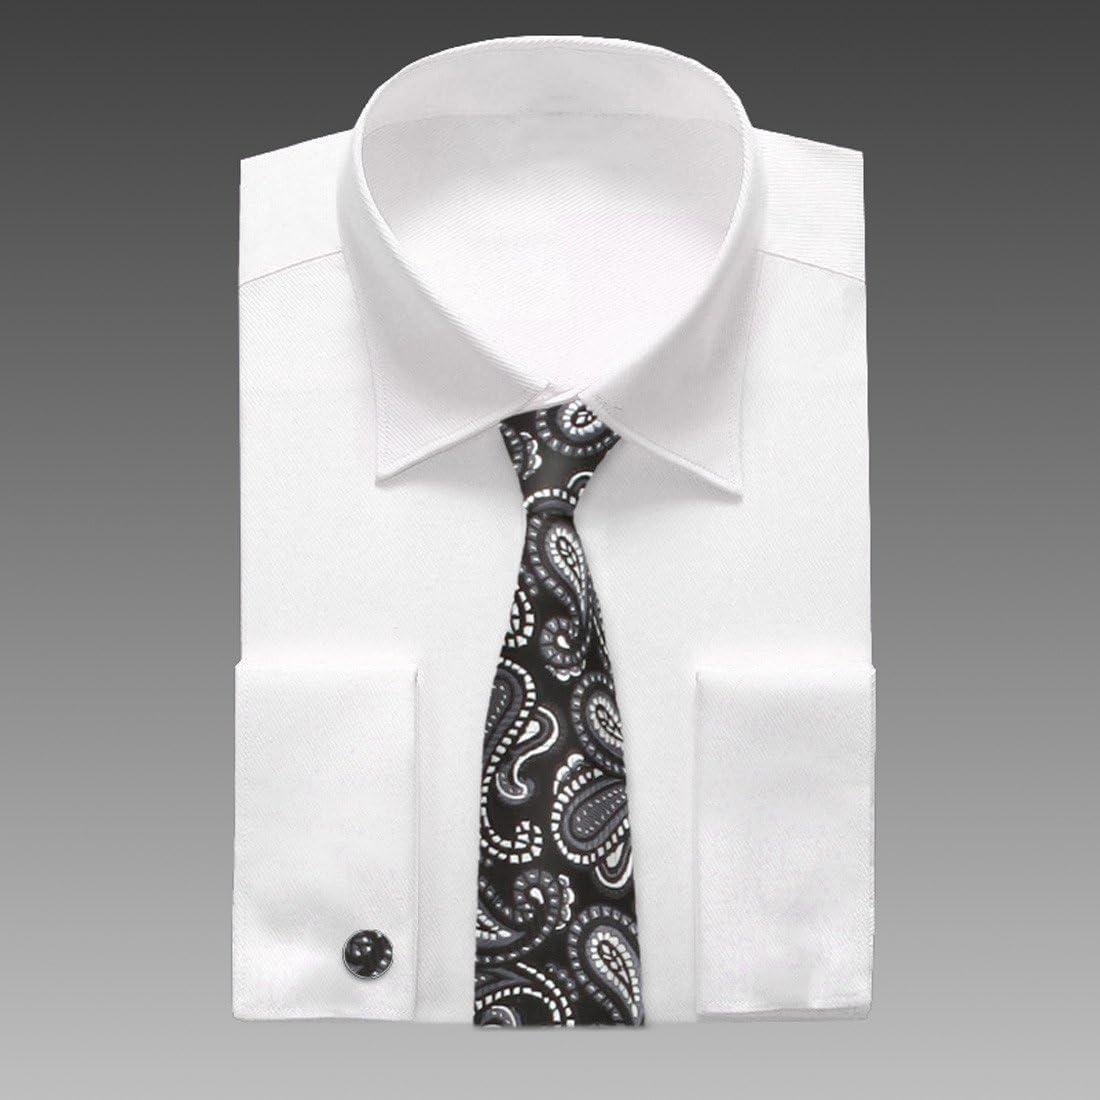 A7001 purple pink paisley gift idea for husband silk mens necktie cufflinks Y/&G